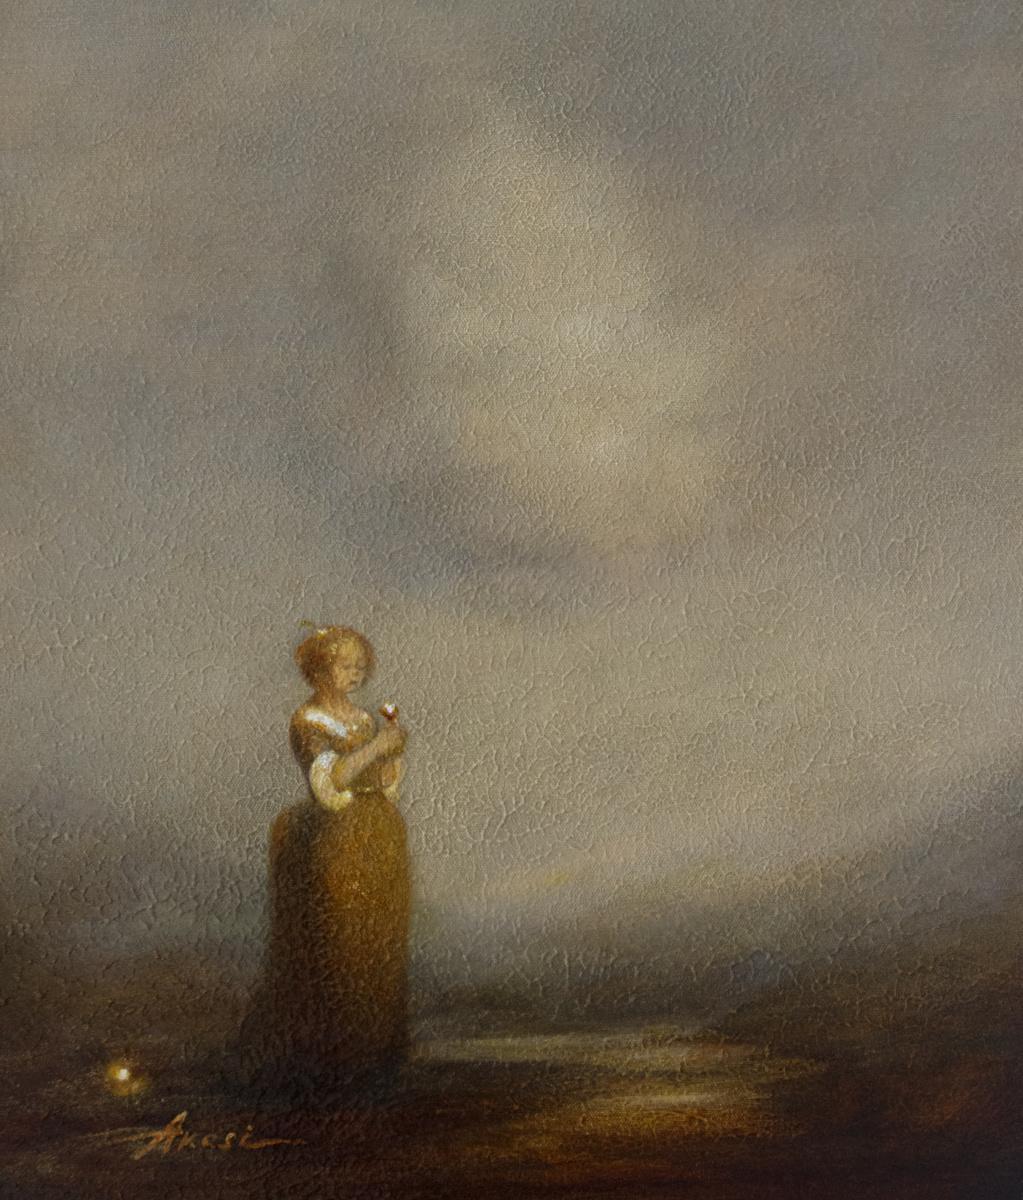 Ольга Акаси. Delicate little cloud